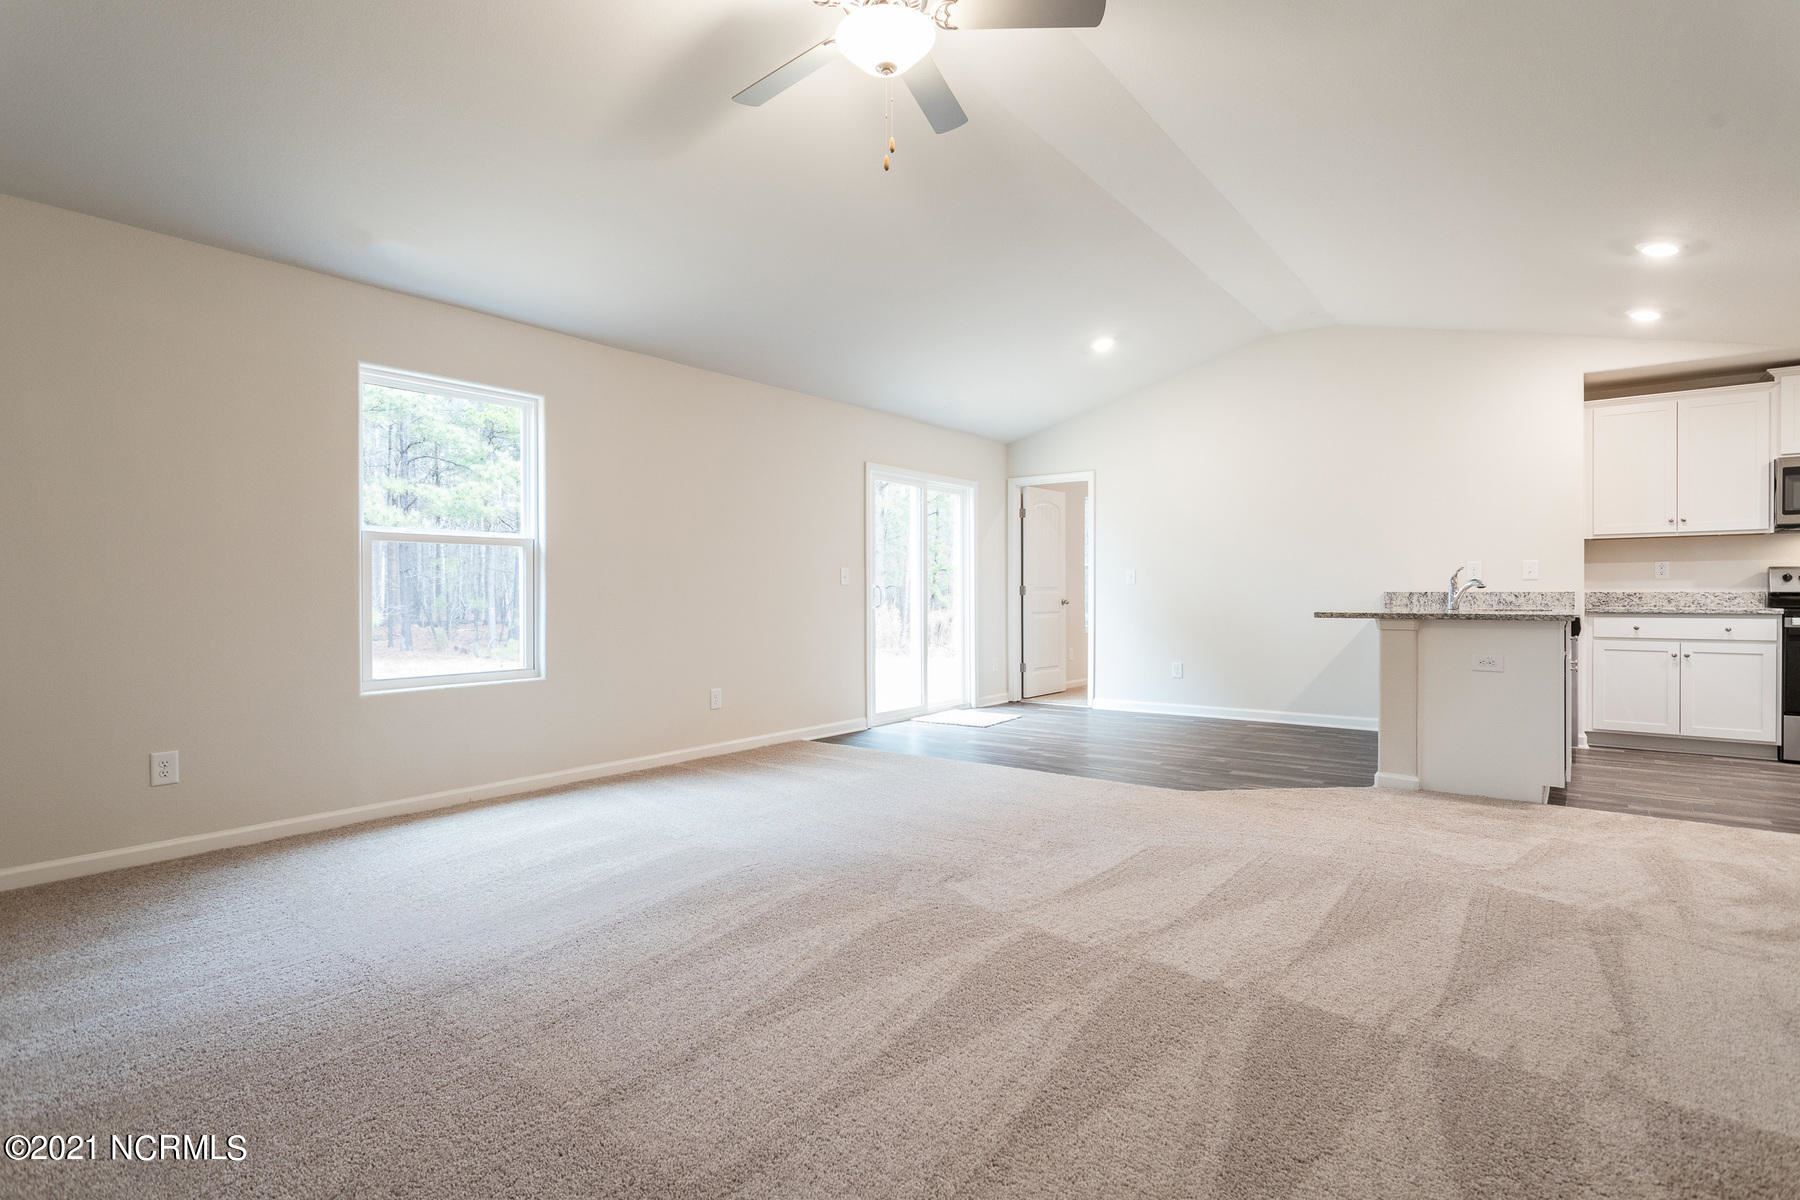 Photo of 401 Poppleton Drive, Hampstead, NC 28443 (MLS # 100293046)